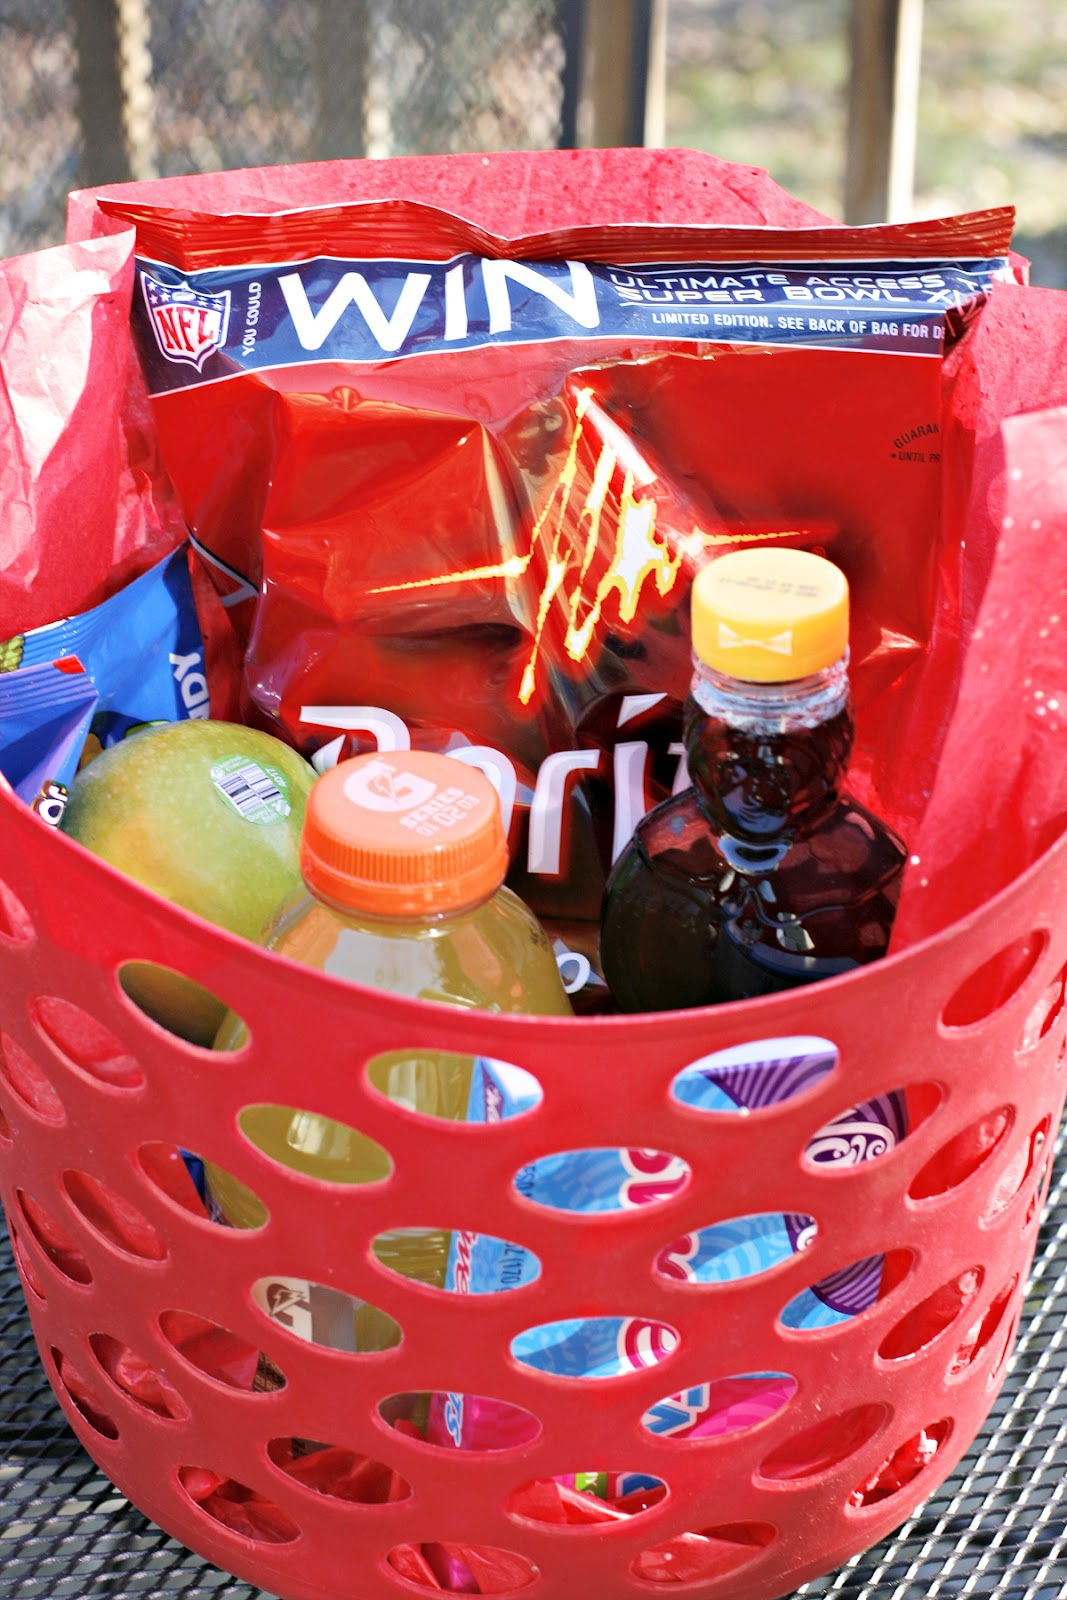 Best Birthday Gift Baskets For Men From CocktailMom Source Image Cocktailmom